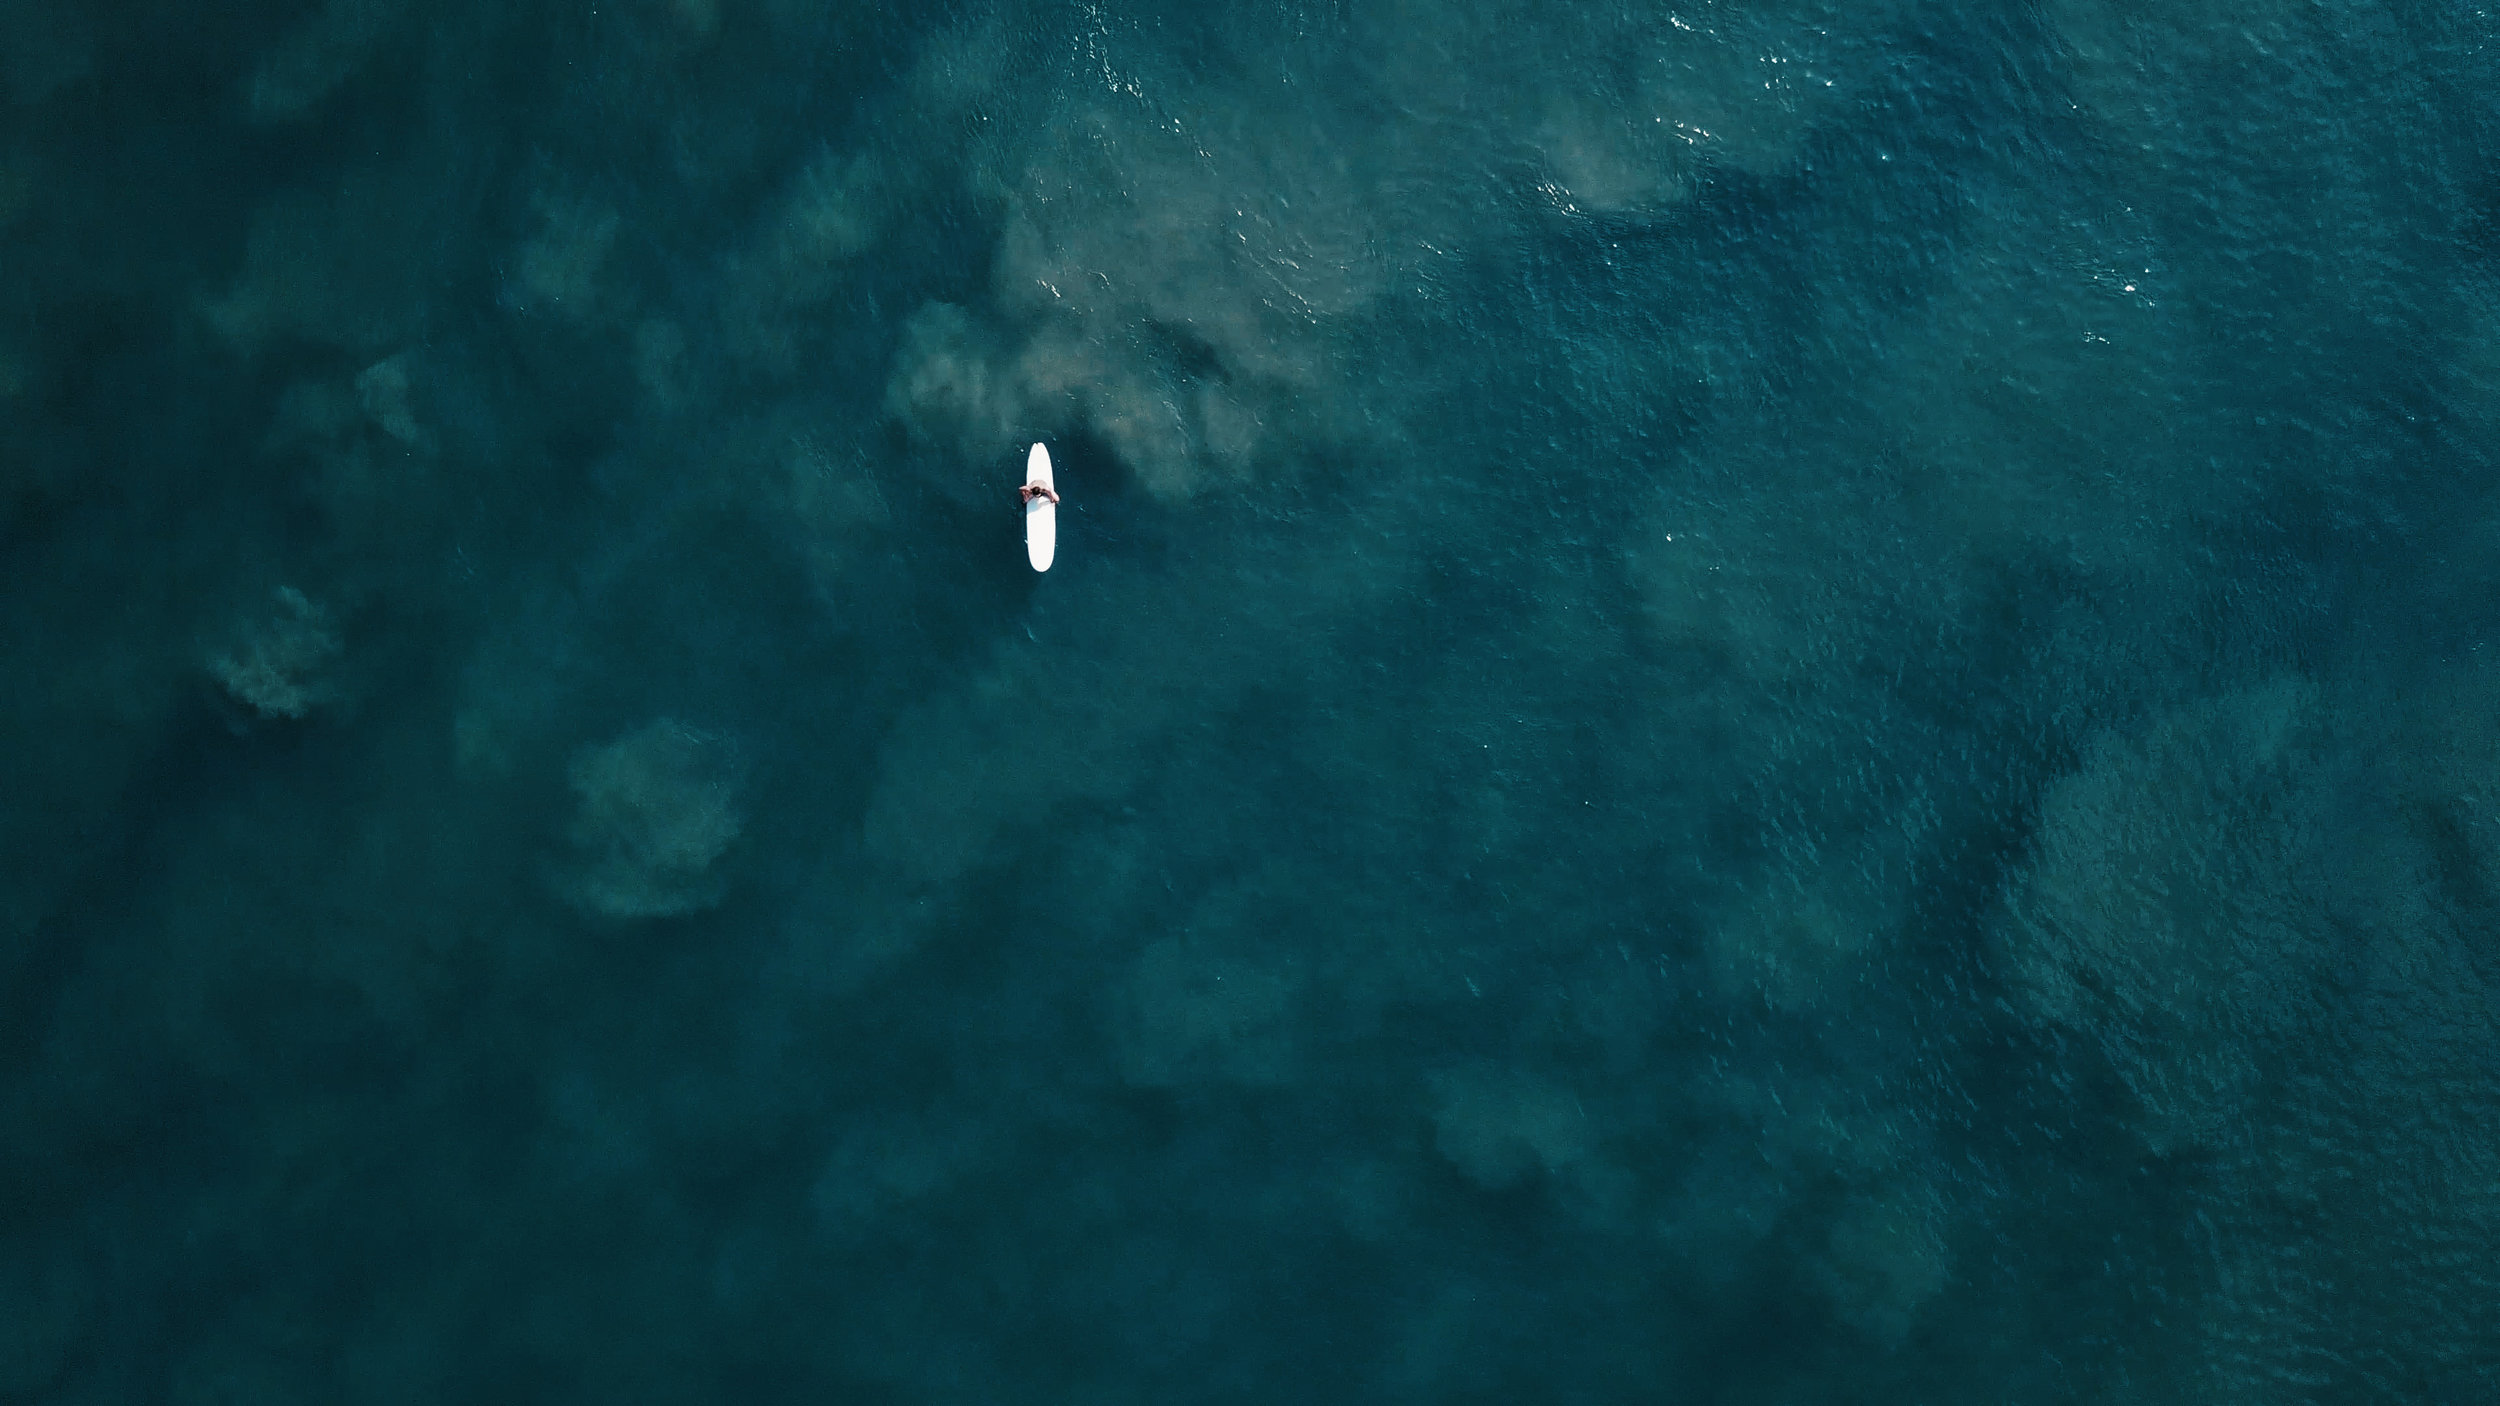 The Solo Surfer